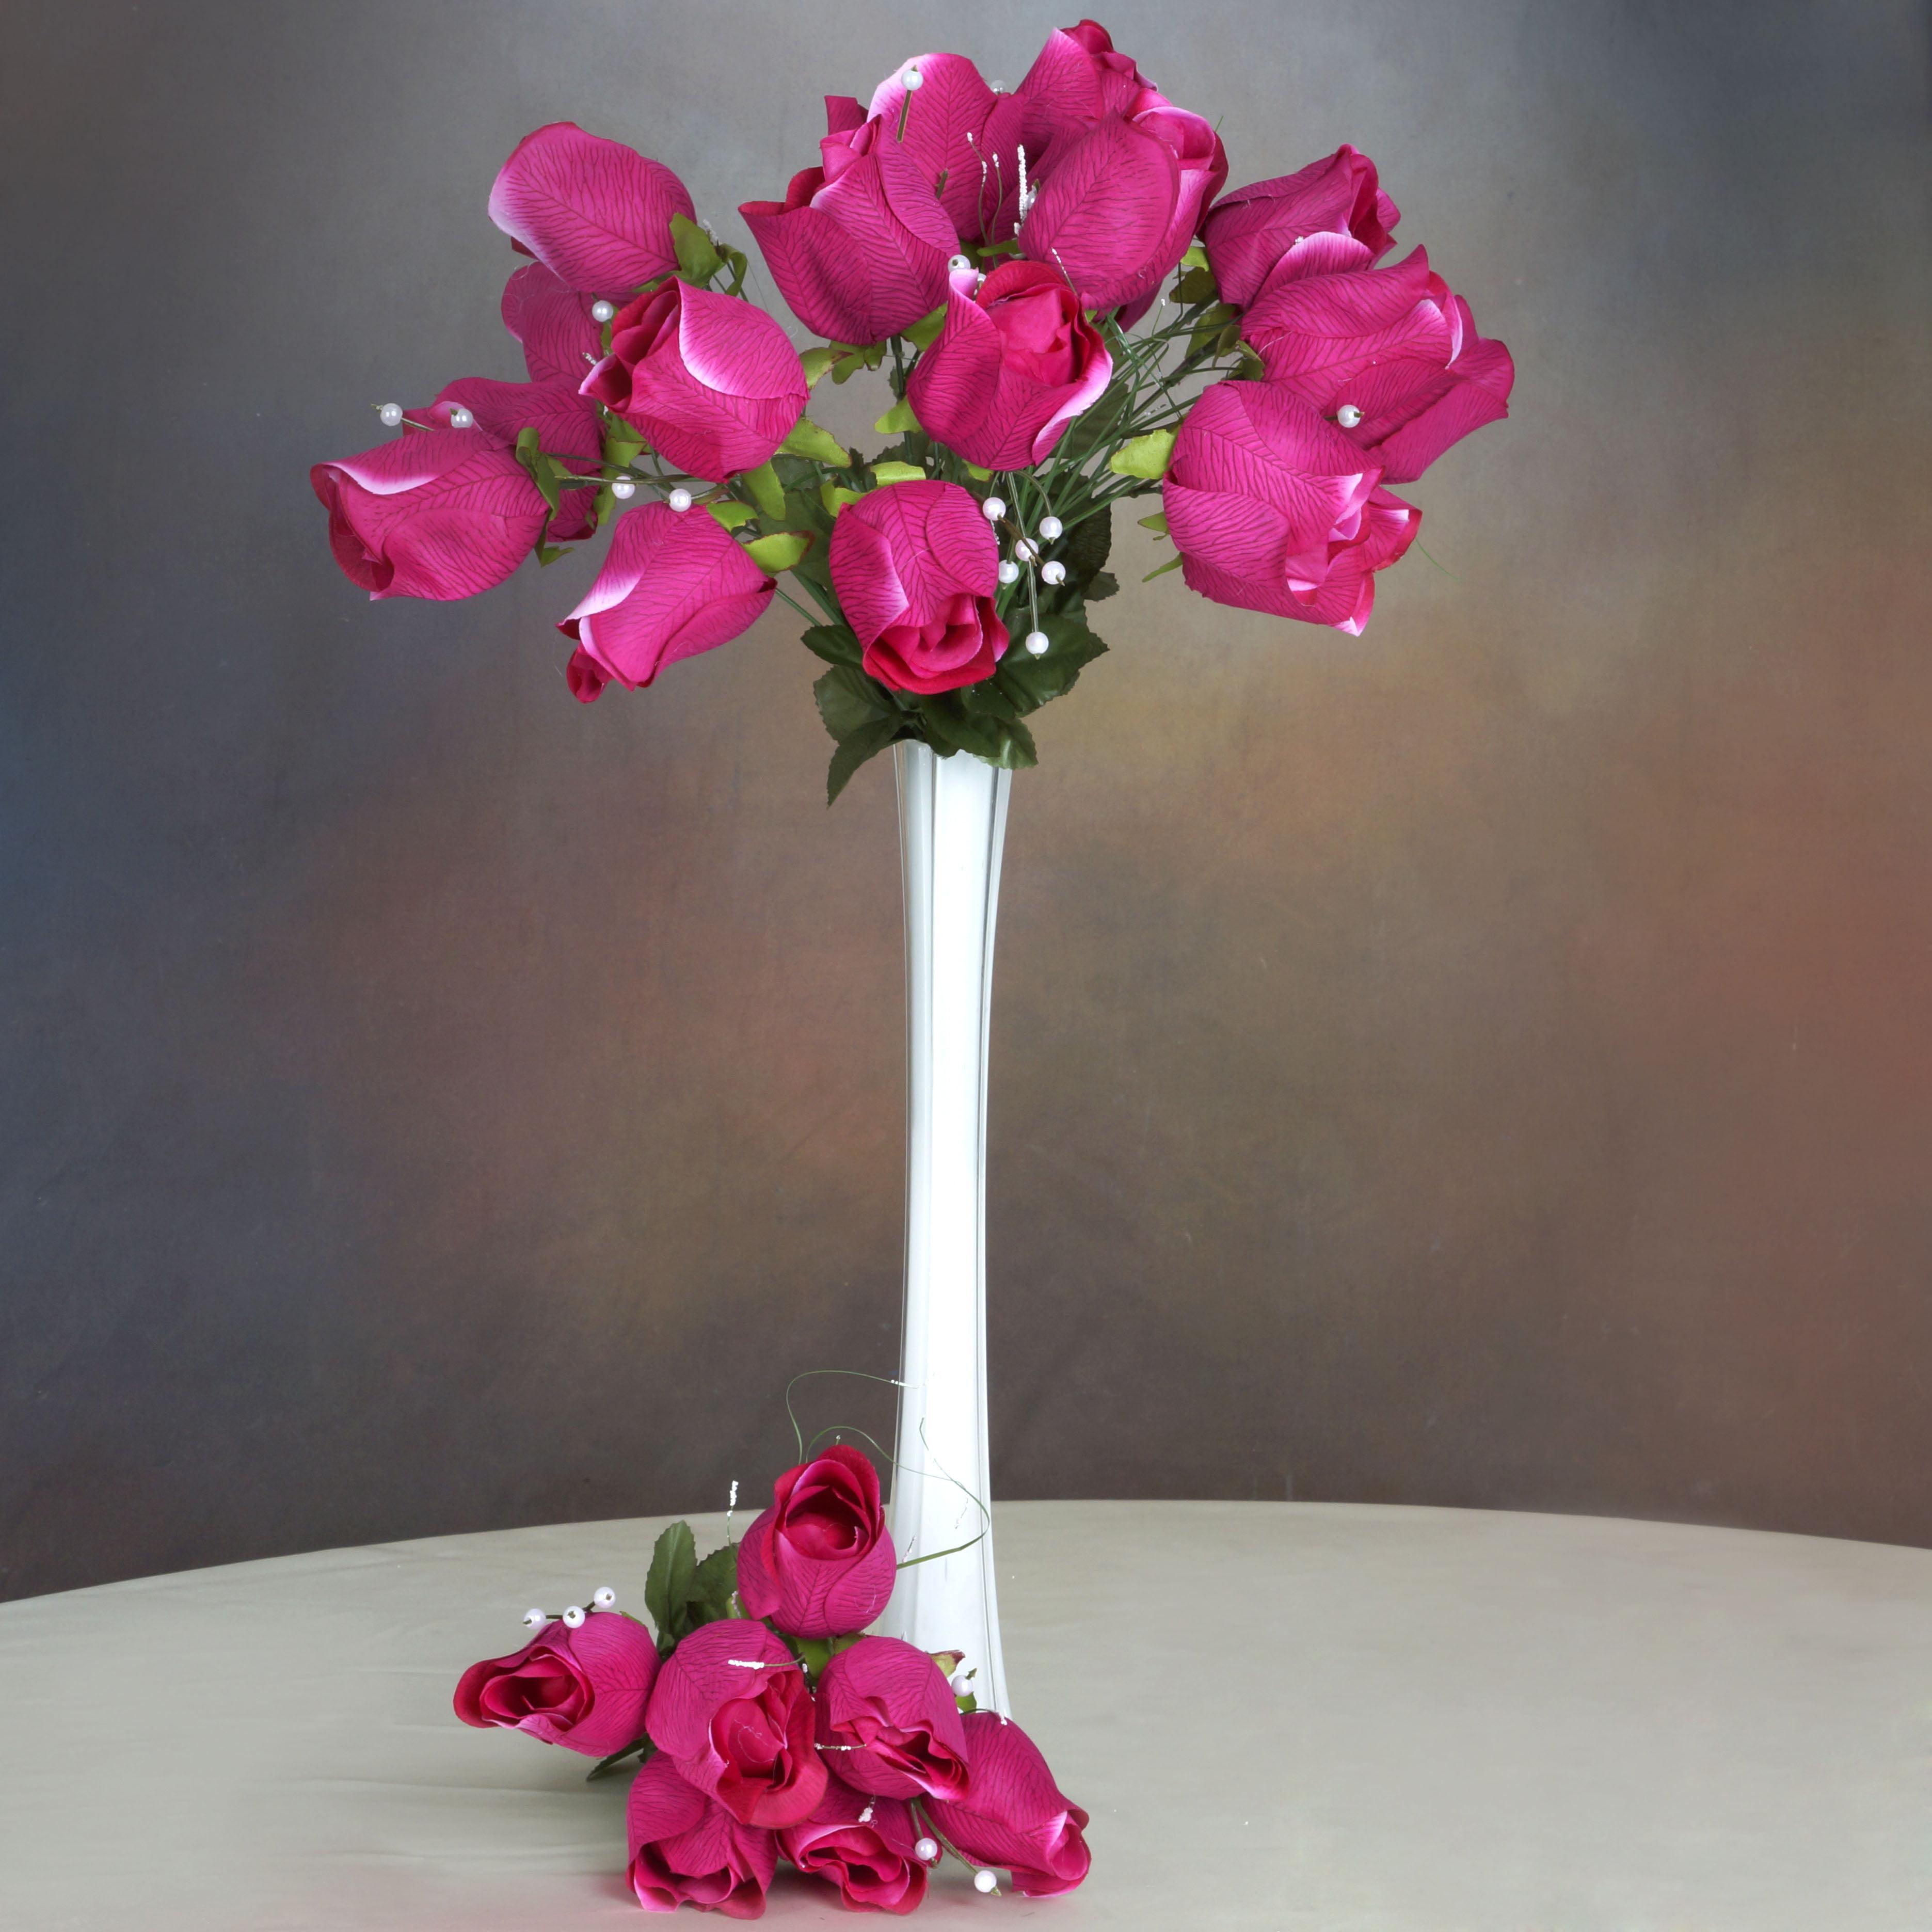 BalsaCircle 42 Giant Velvet Rose Buds on Long Stems - Artificial Flowers DIY Home Wedding Party Bouquets Arrangements Centerpieces